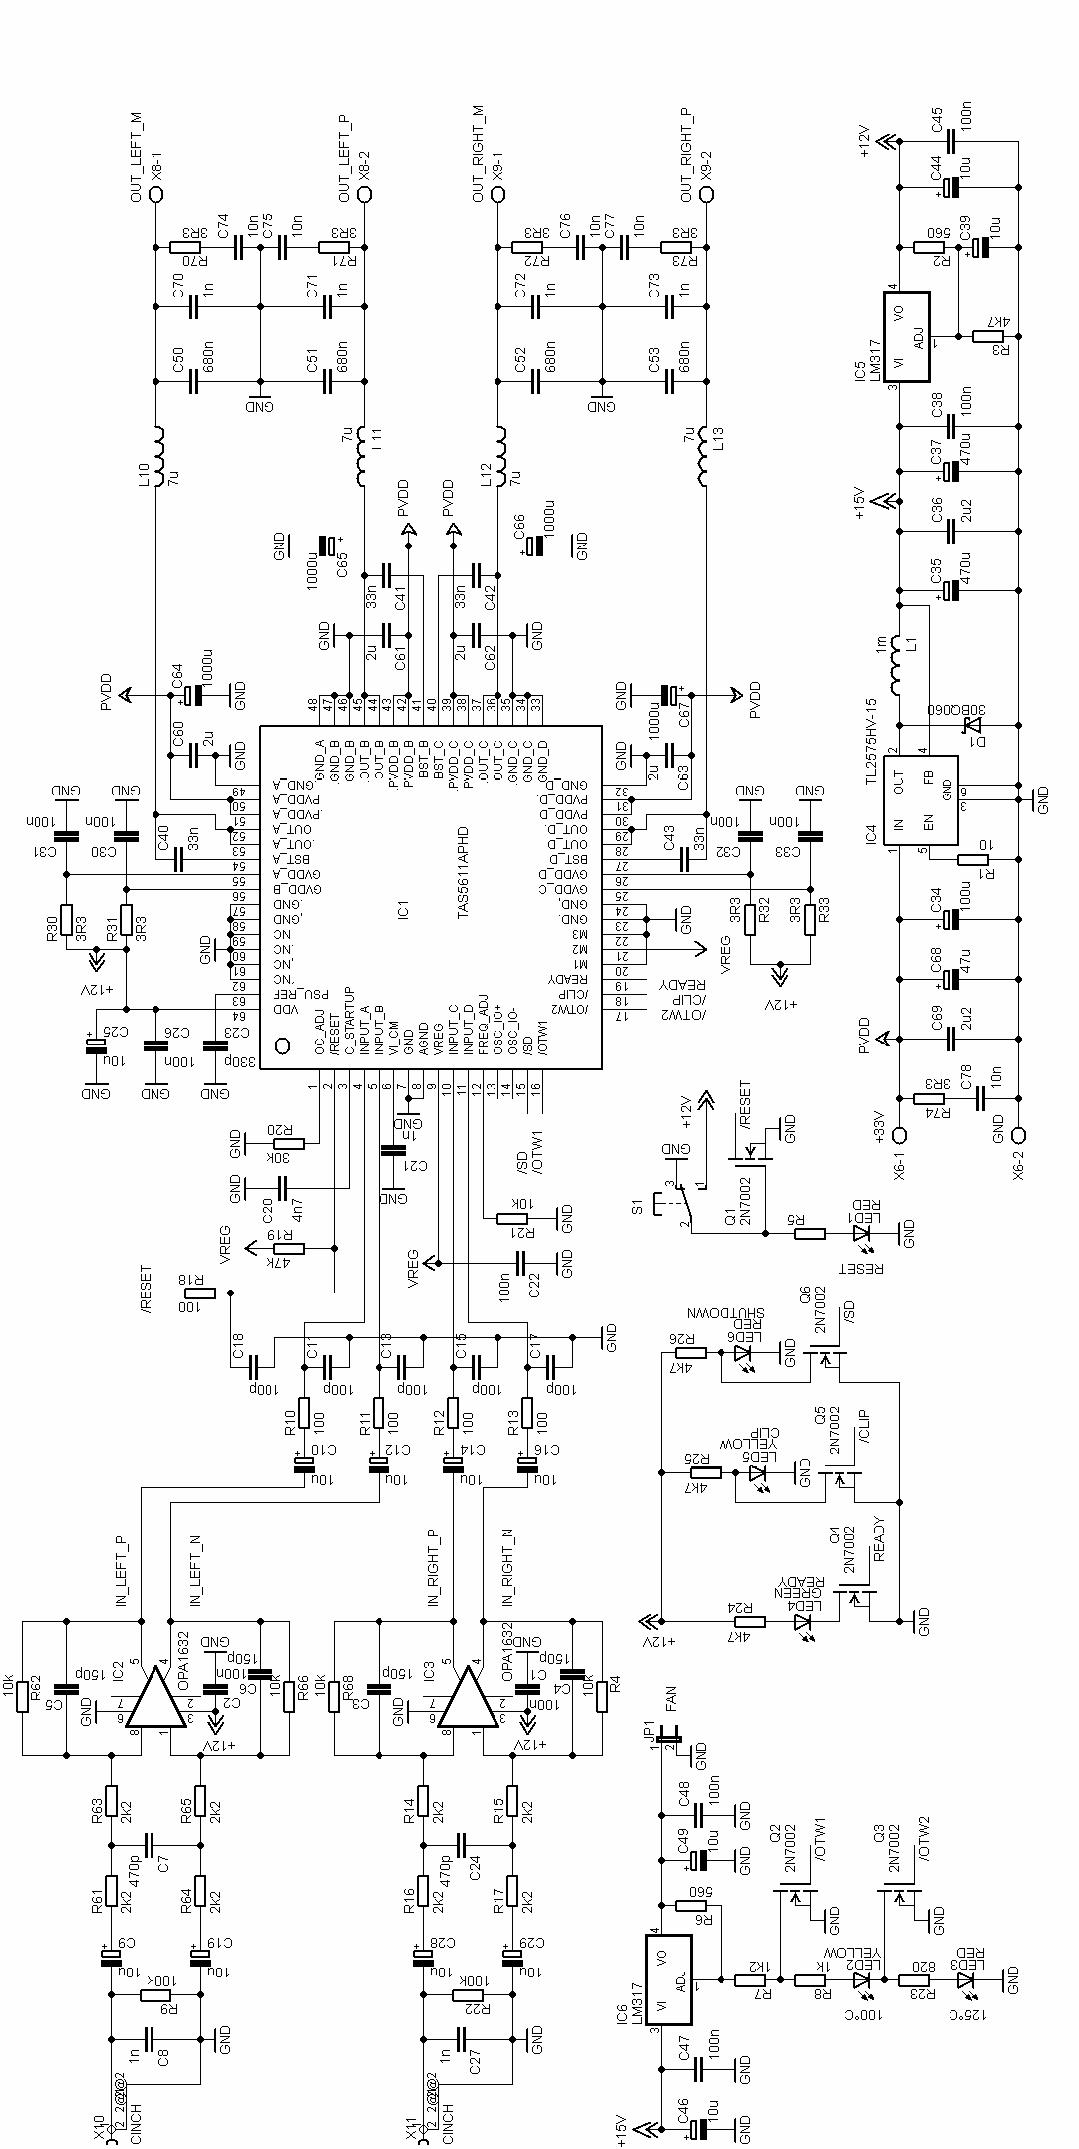 tas5611a class d amplifier circuit project